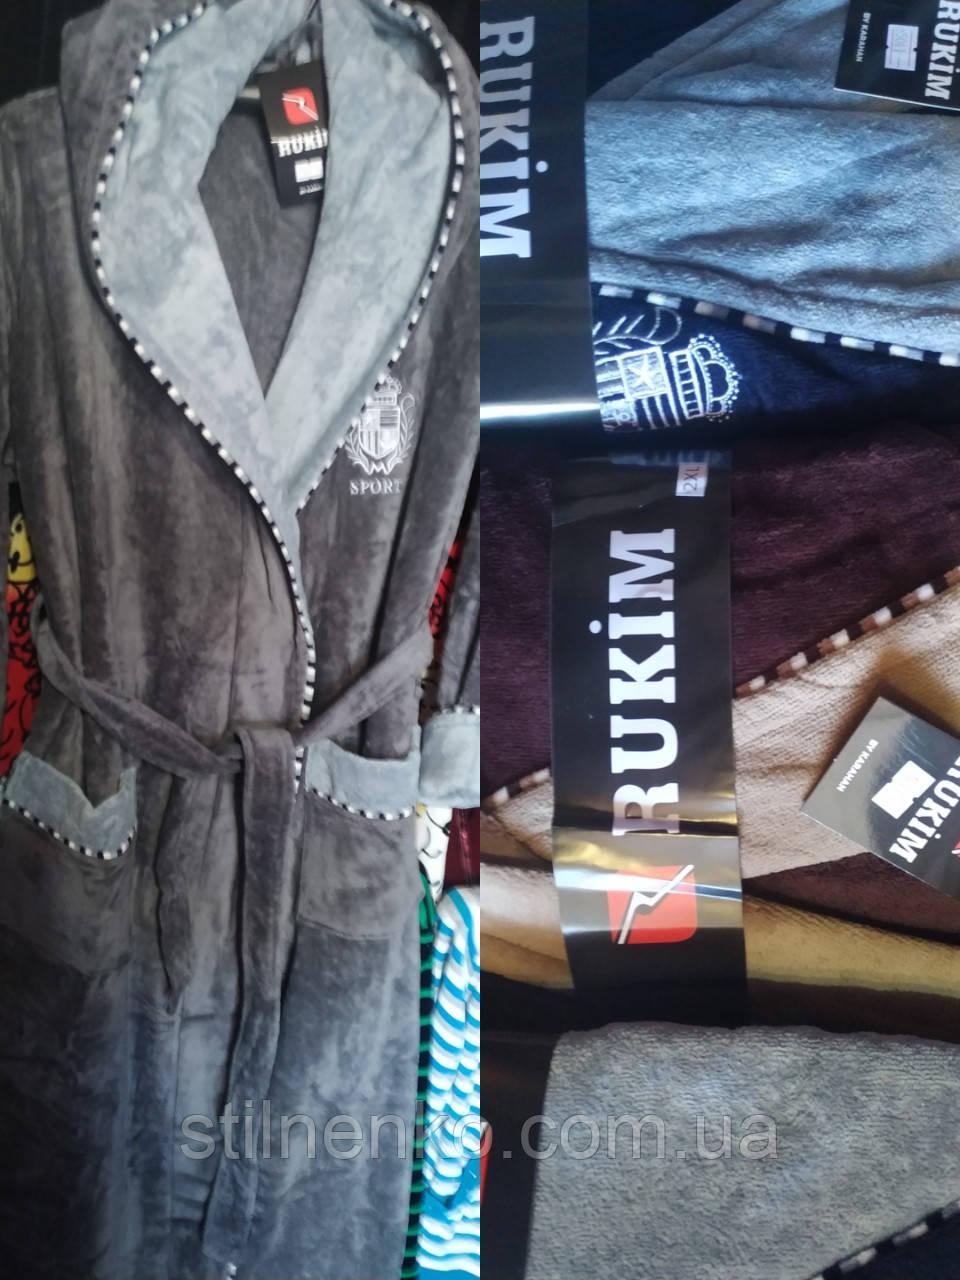 Мужской натуральный халат Rukim, 100% хлопок